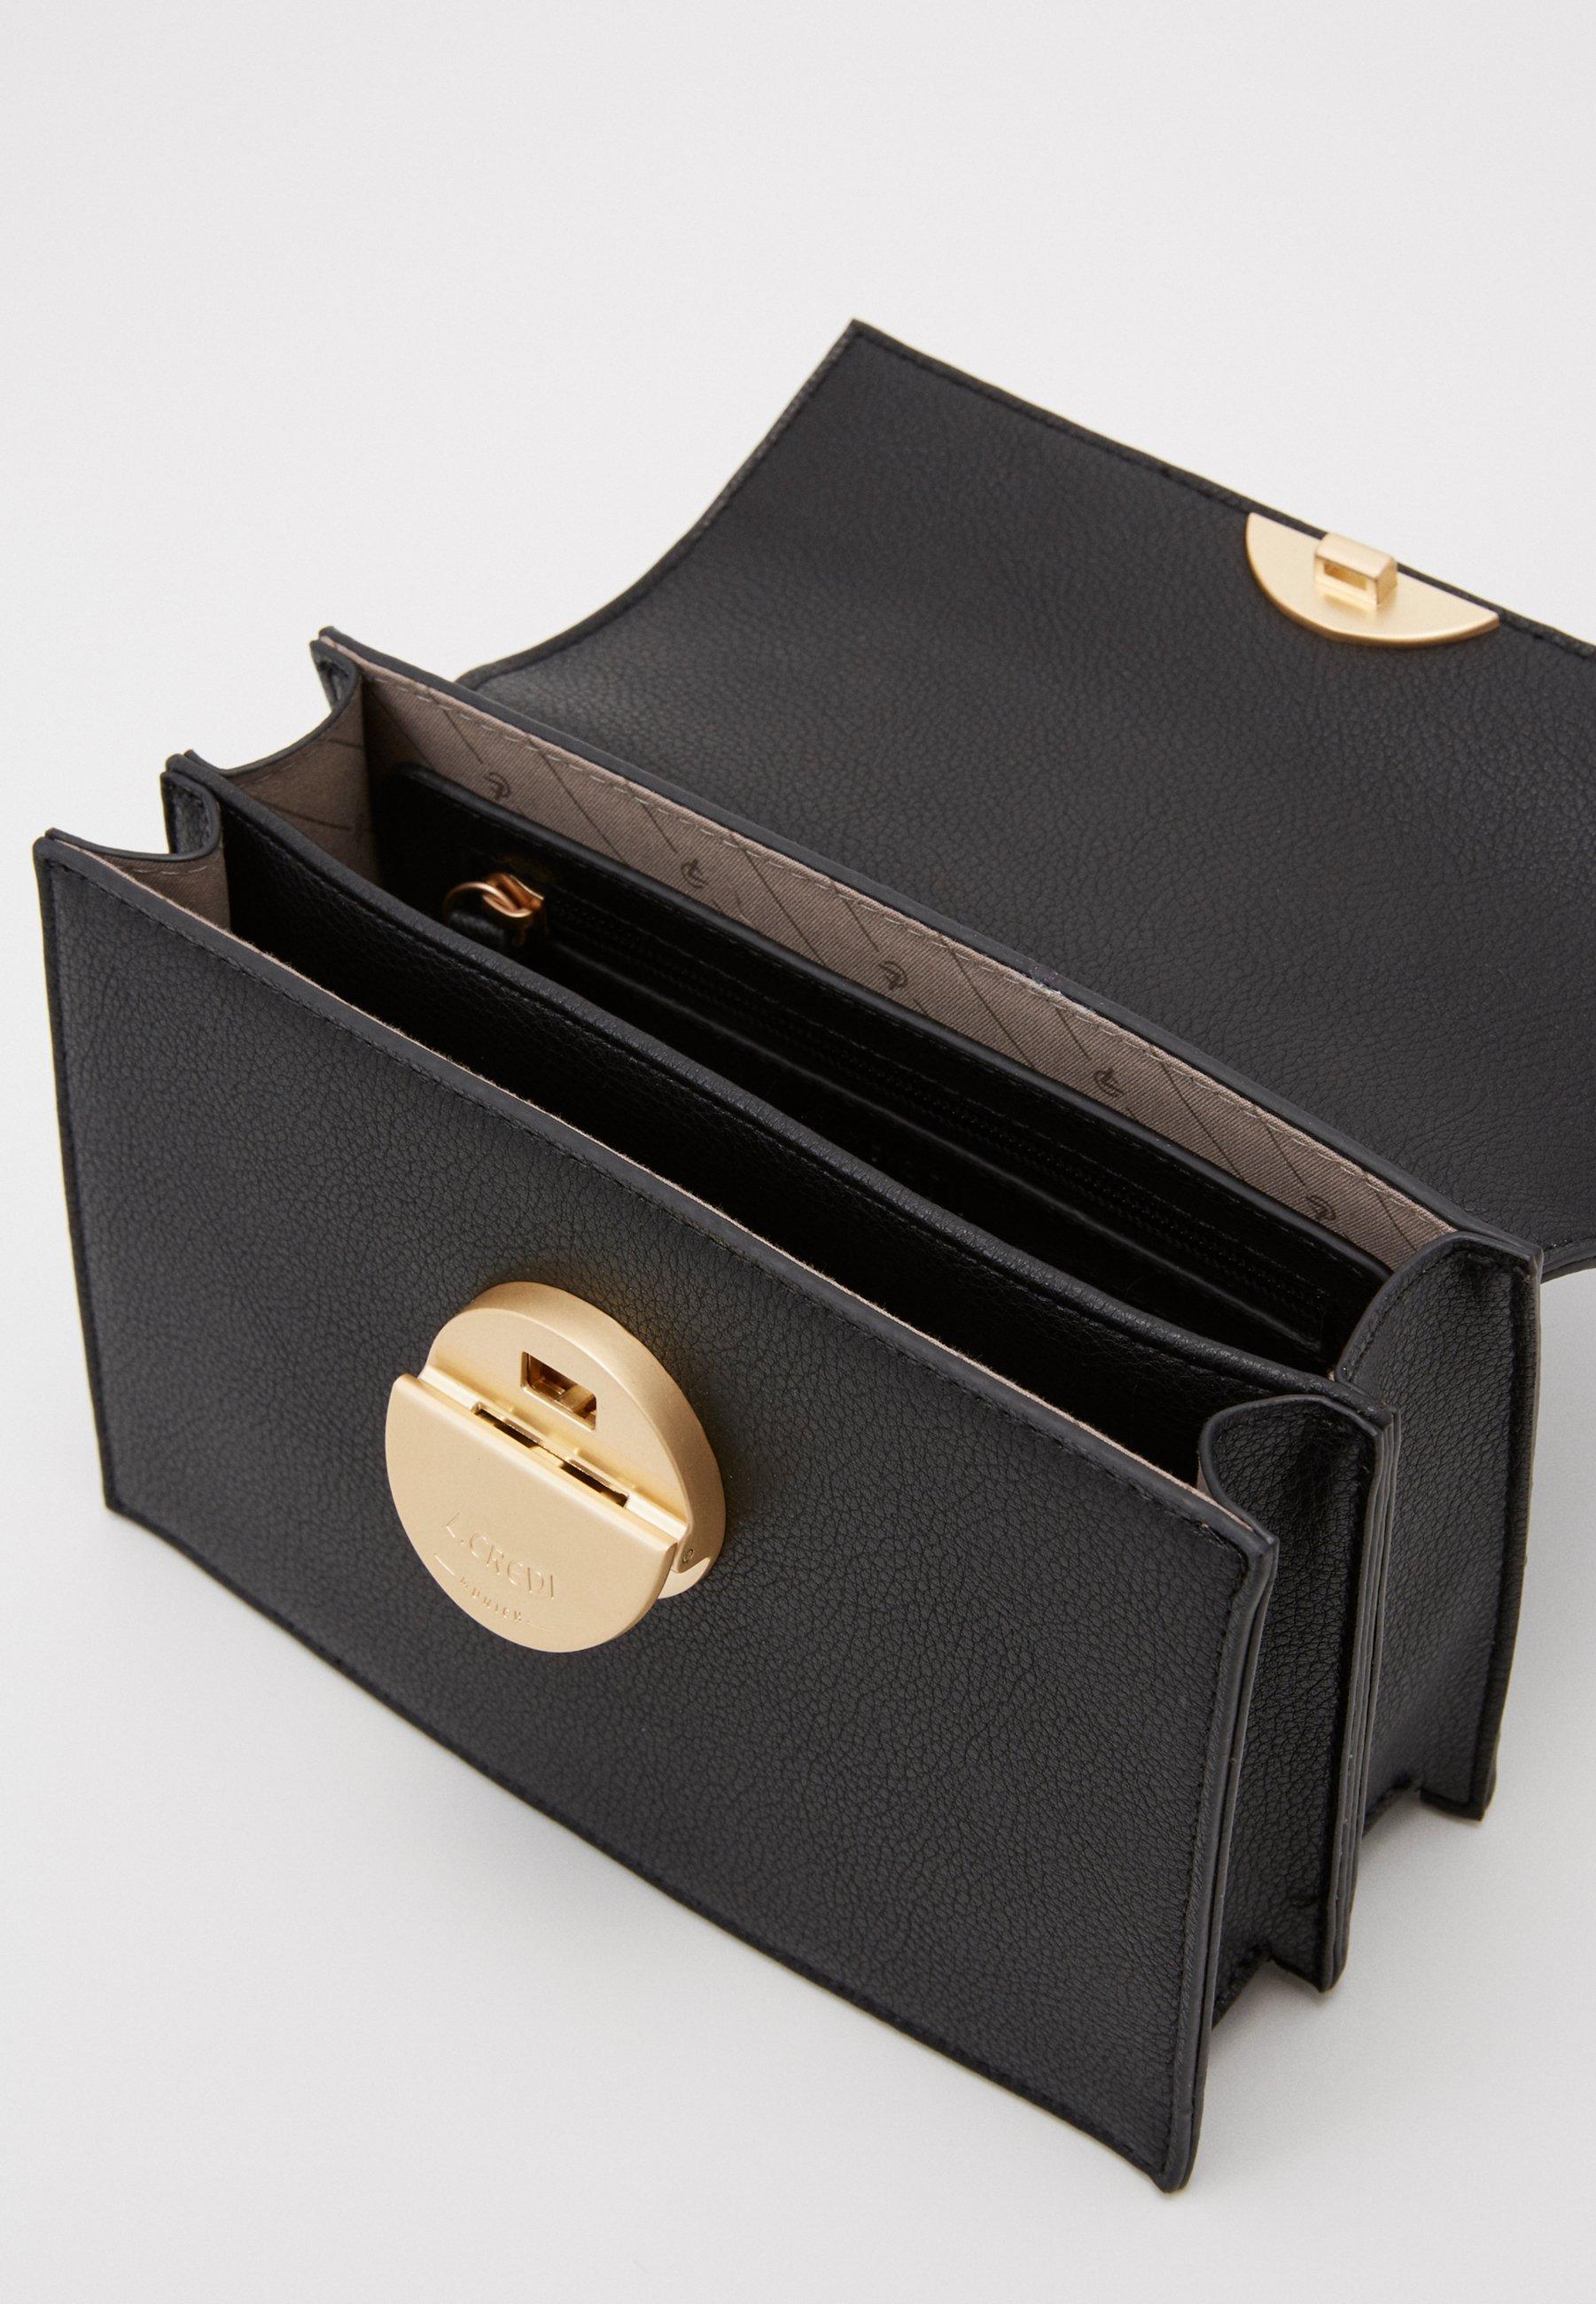 Latest Discount Outlet L.Credi FABRIZIA - Across body bag - schwarz   women's accessories 2020 opnlX